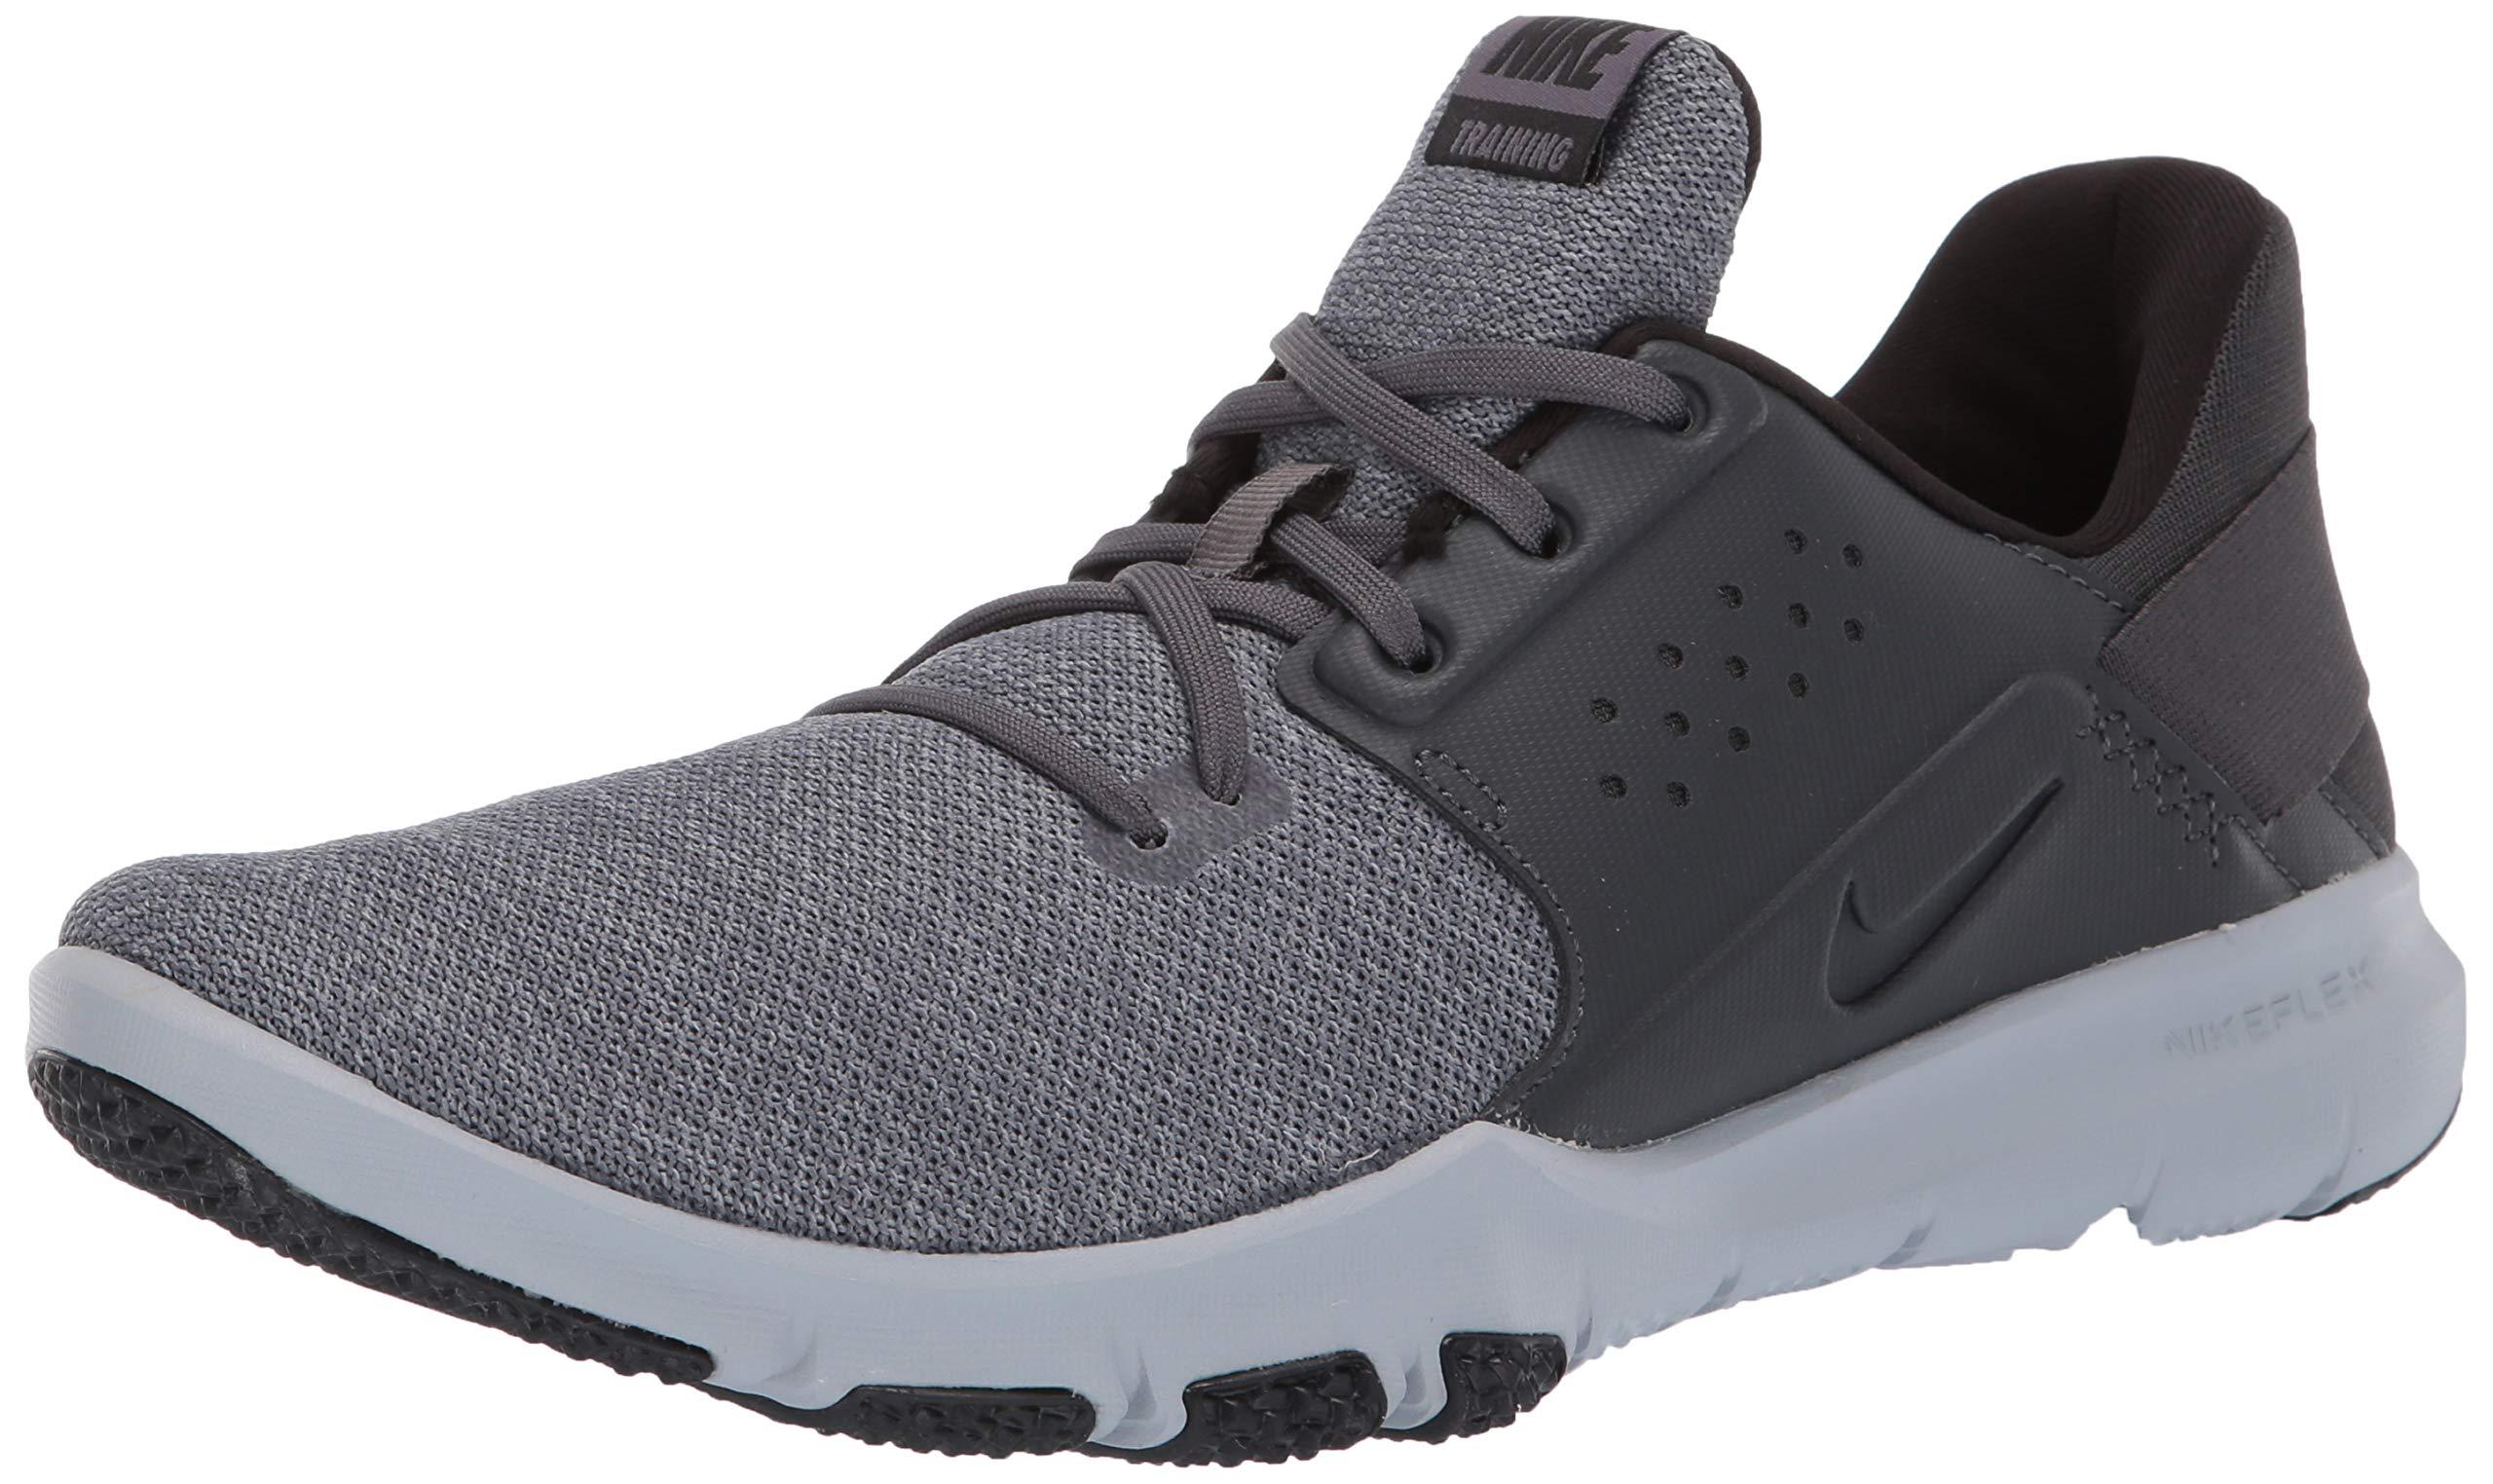 Nike Men's Flex Control TR3 Sneaker, Anthracite/Anthracite - Black, 10 Regular US by Nike